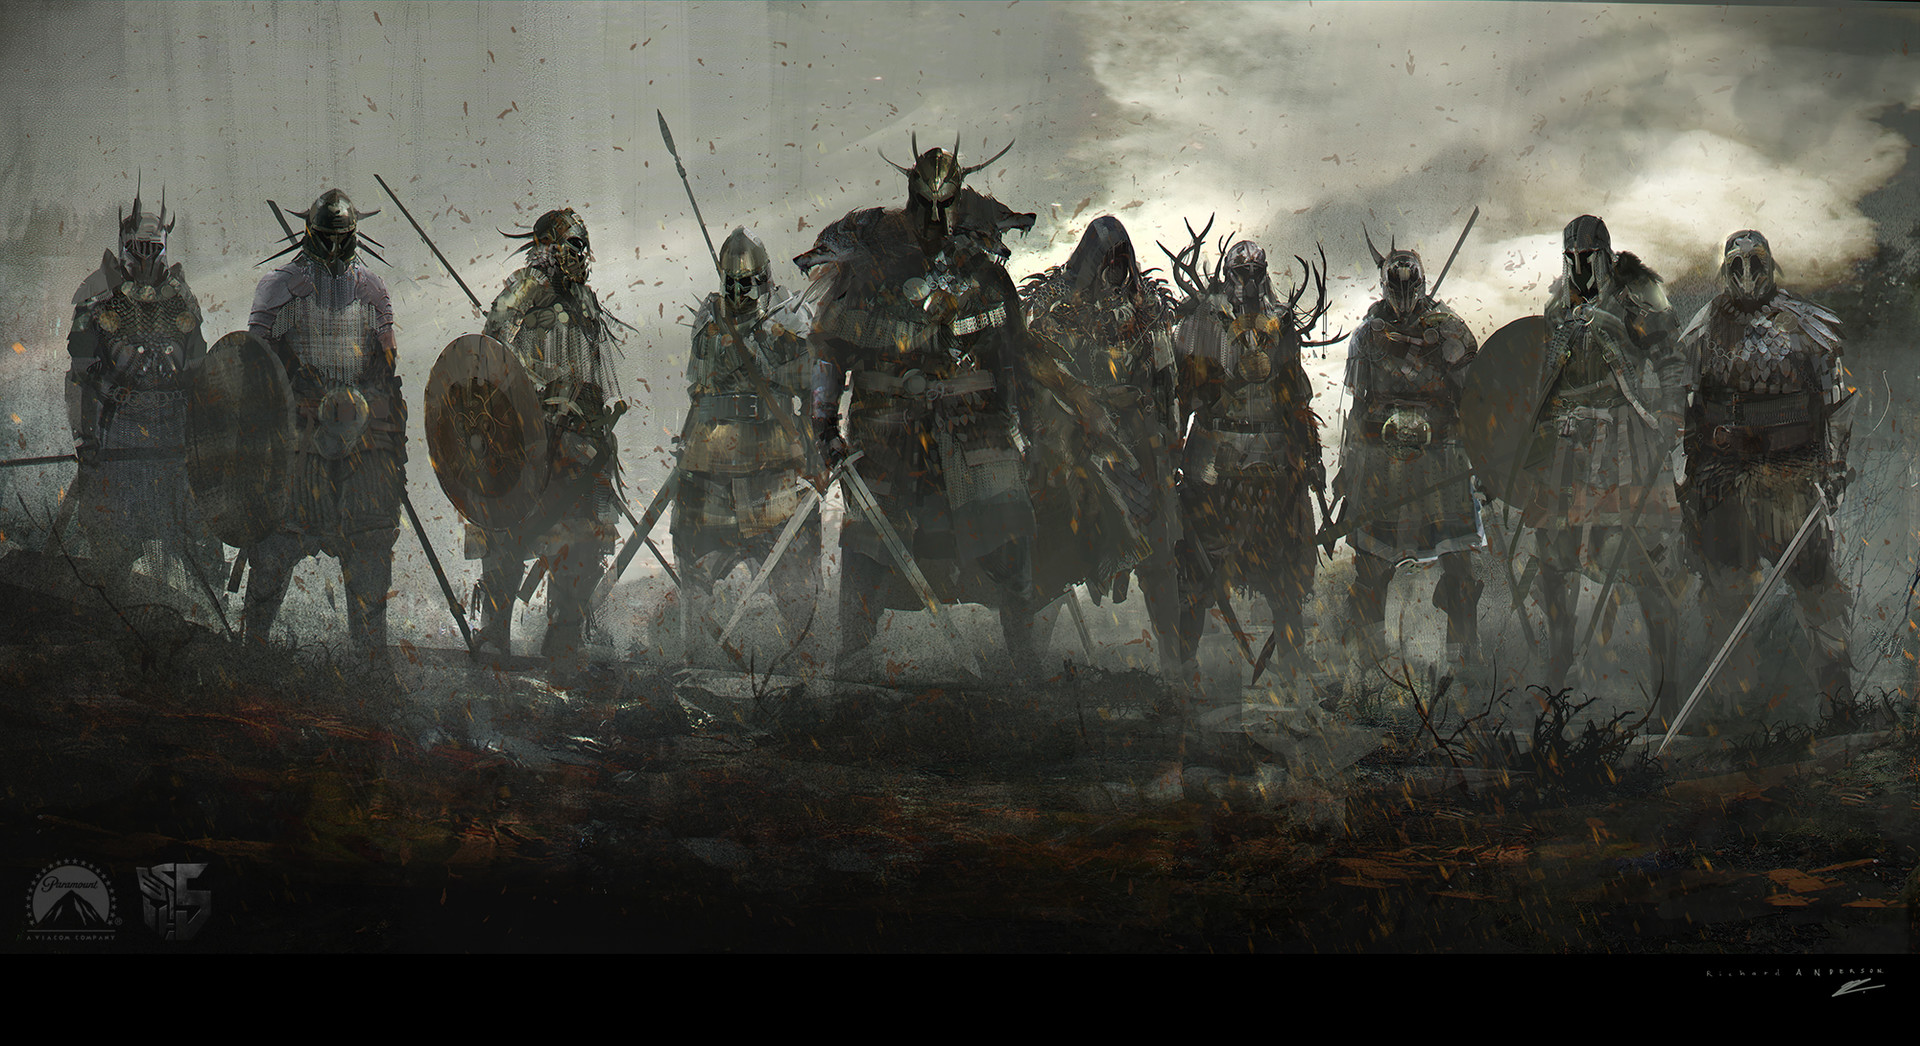 King Arthur The Last Knight Transformers